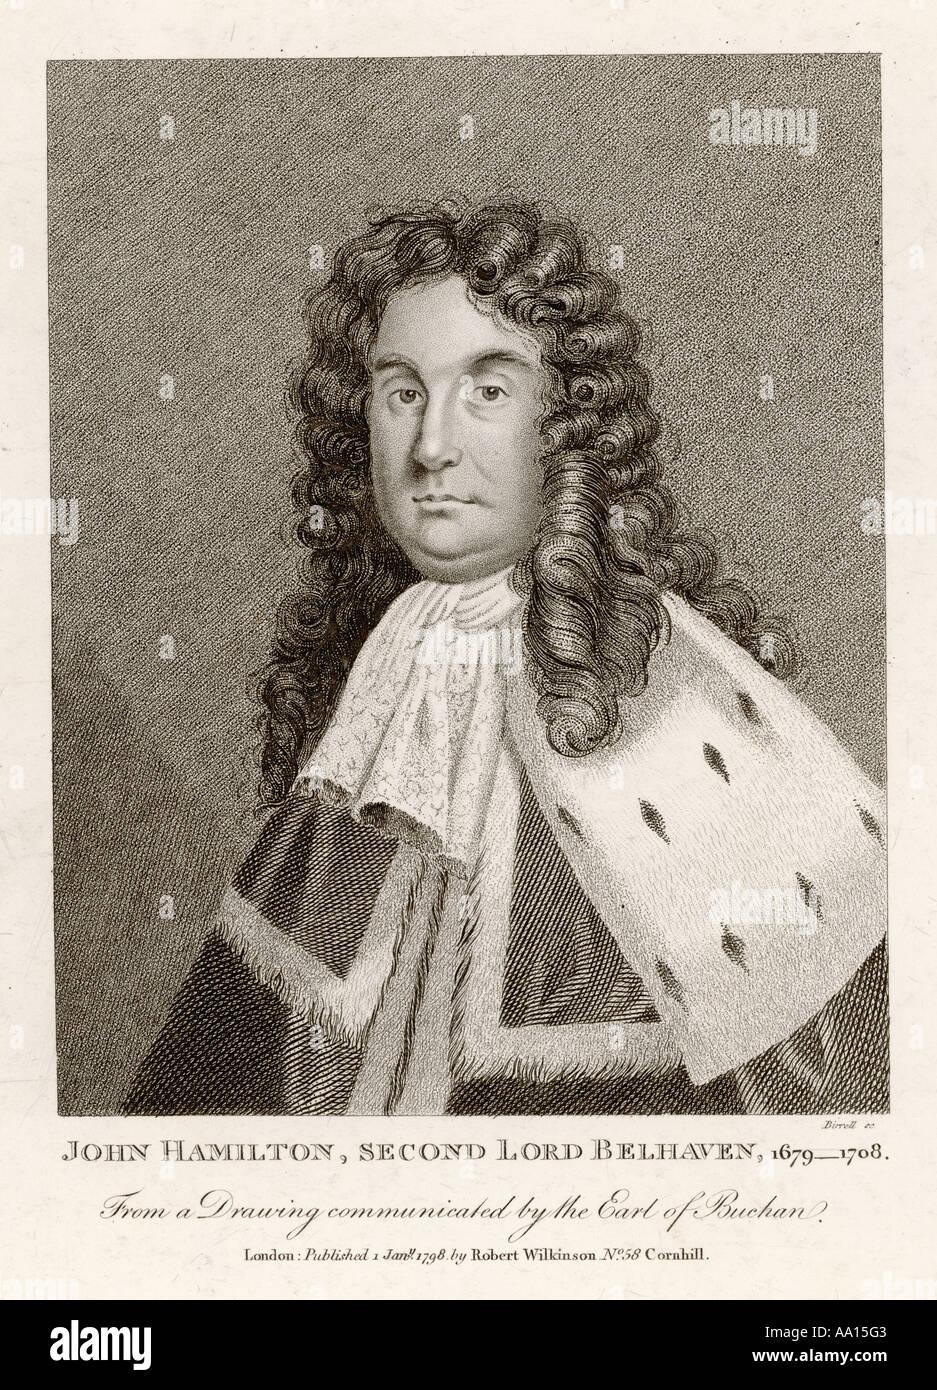 John Hamilton - Stock Image